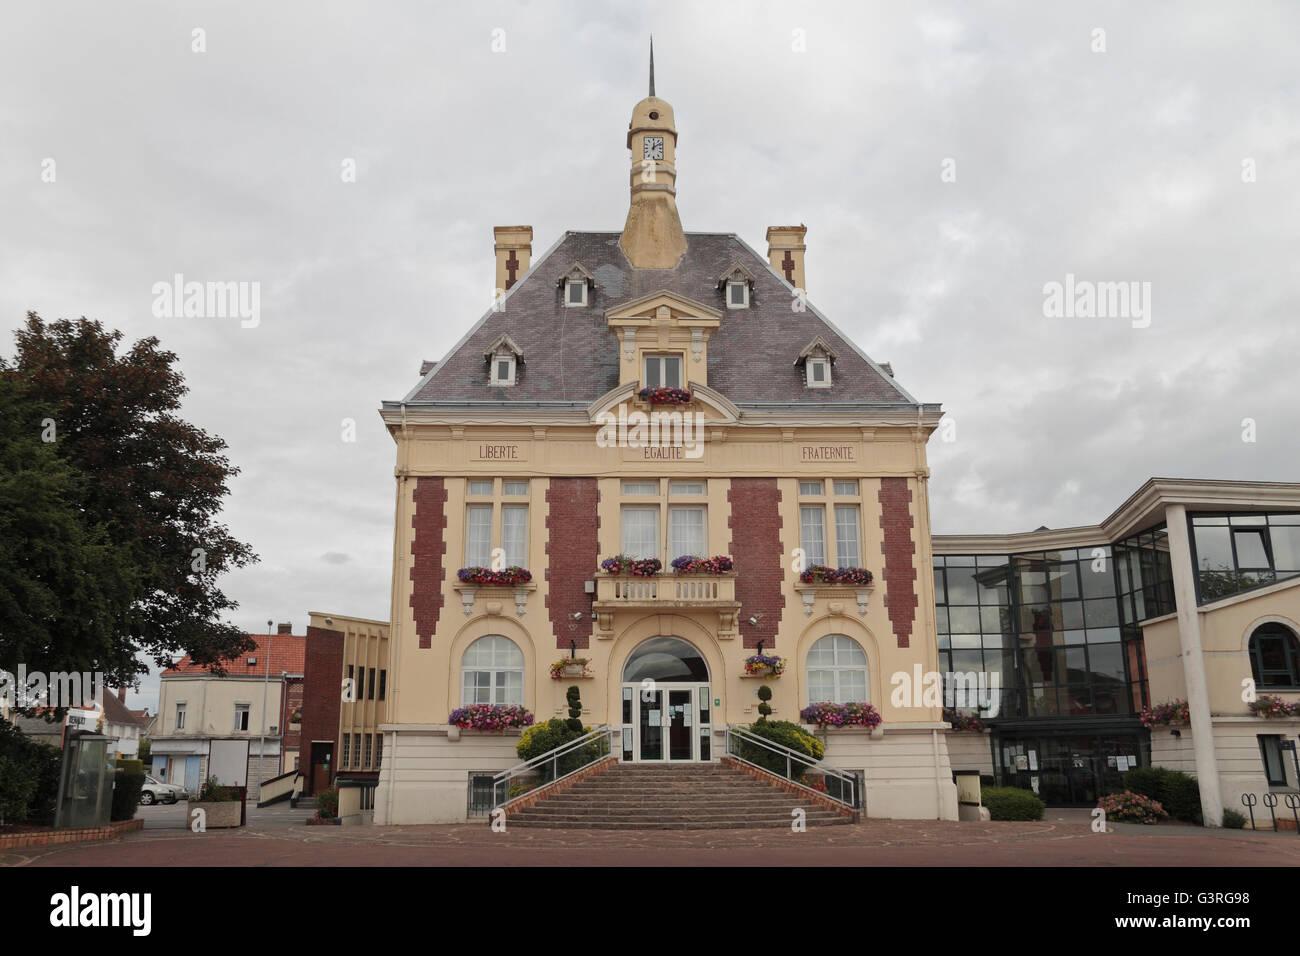 Loos town hall, Loos, Pas de Calais, France. - Stock Image